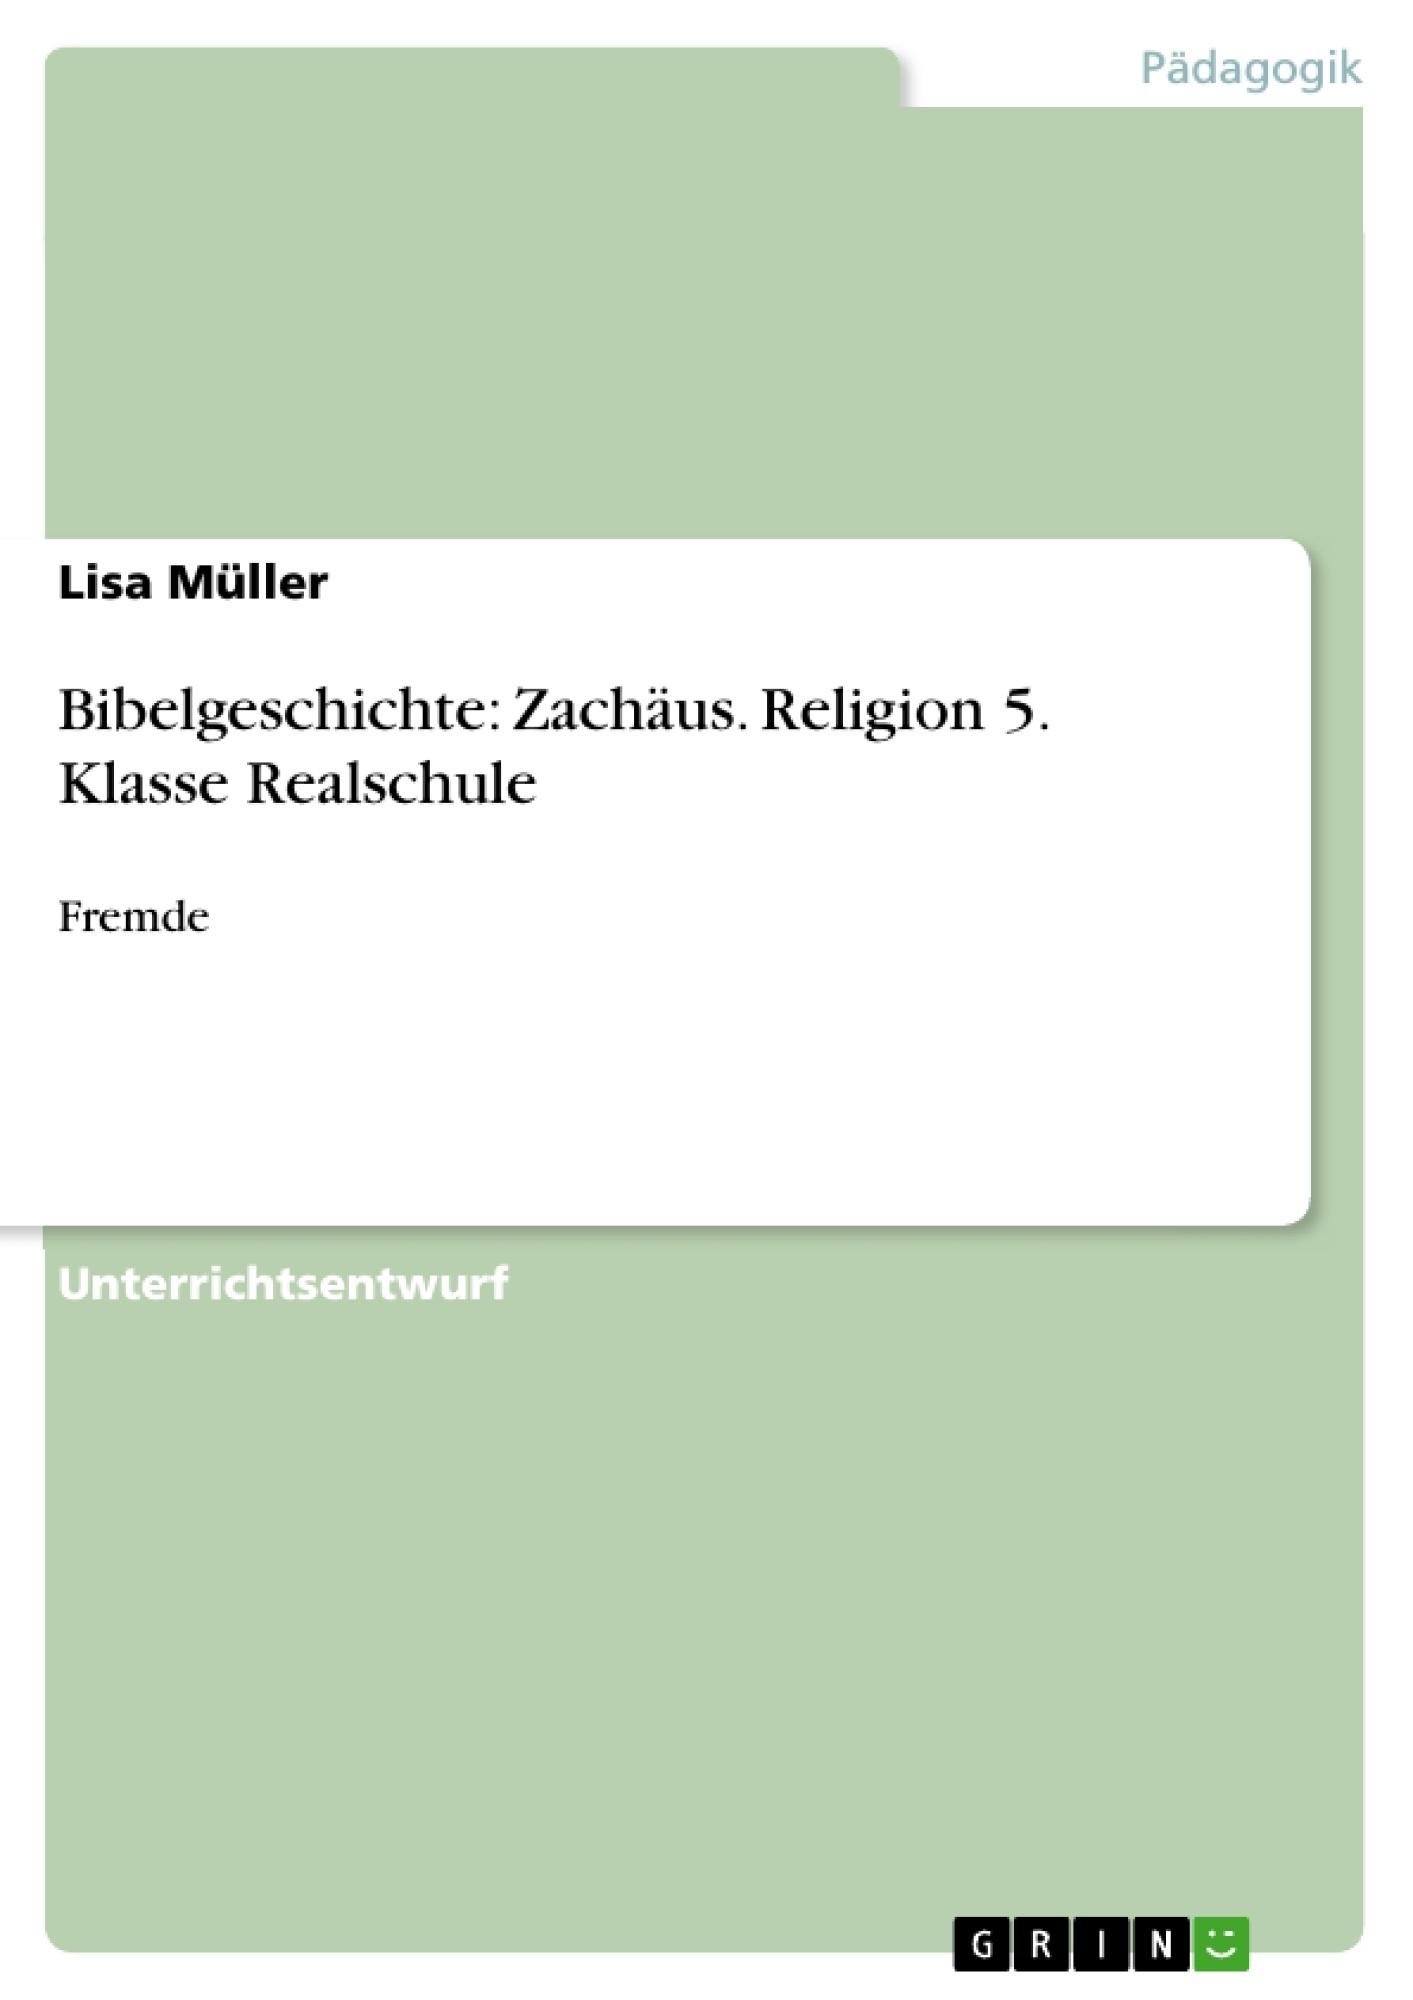 Titel: Bibelgeschichte: Zachäus. Religion 5. Klasse Realschule